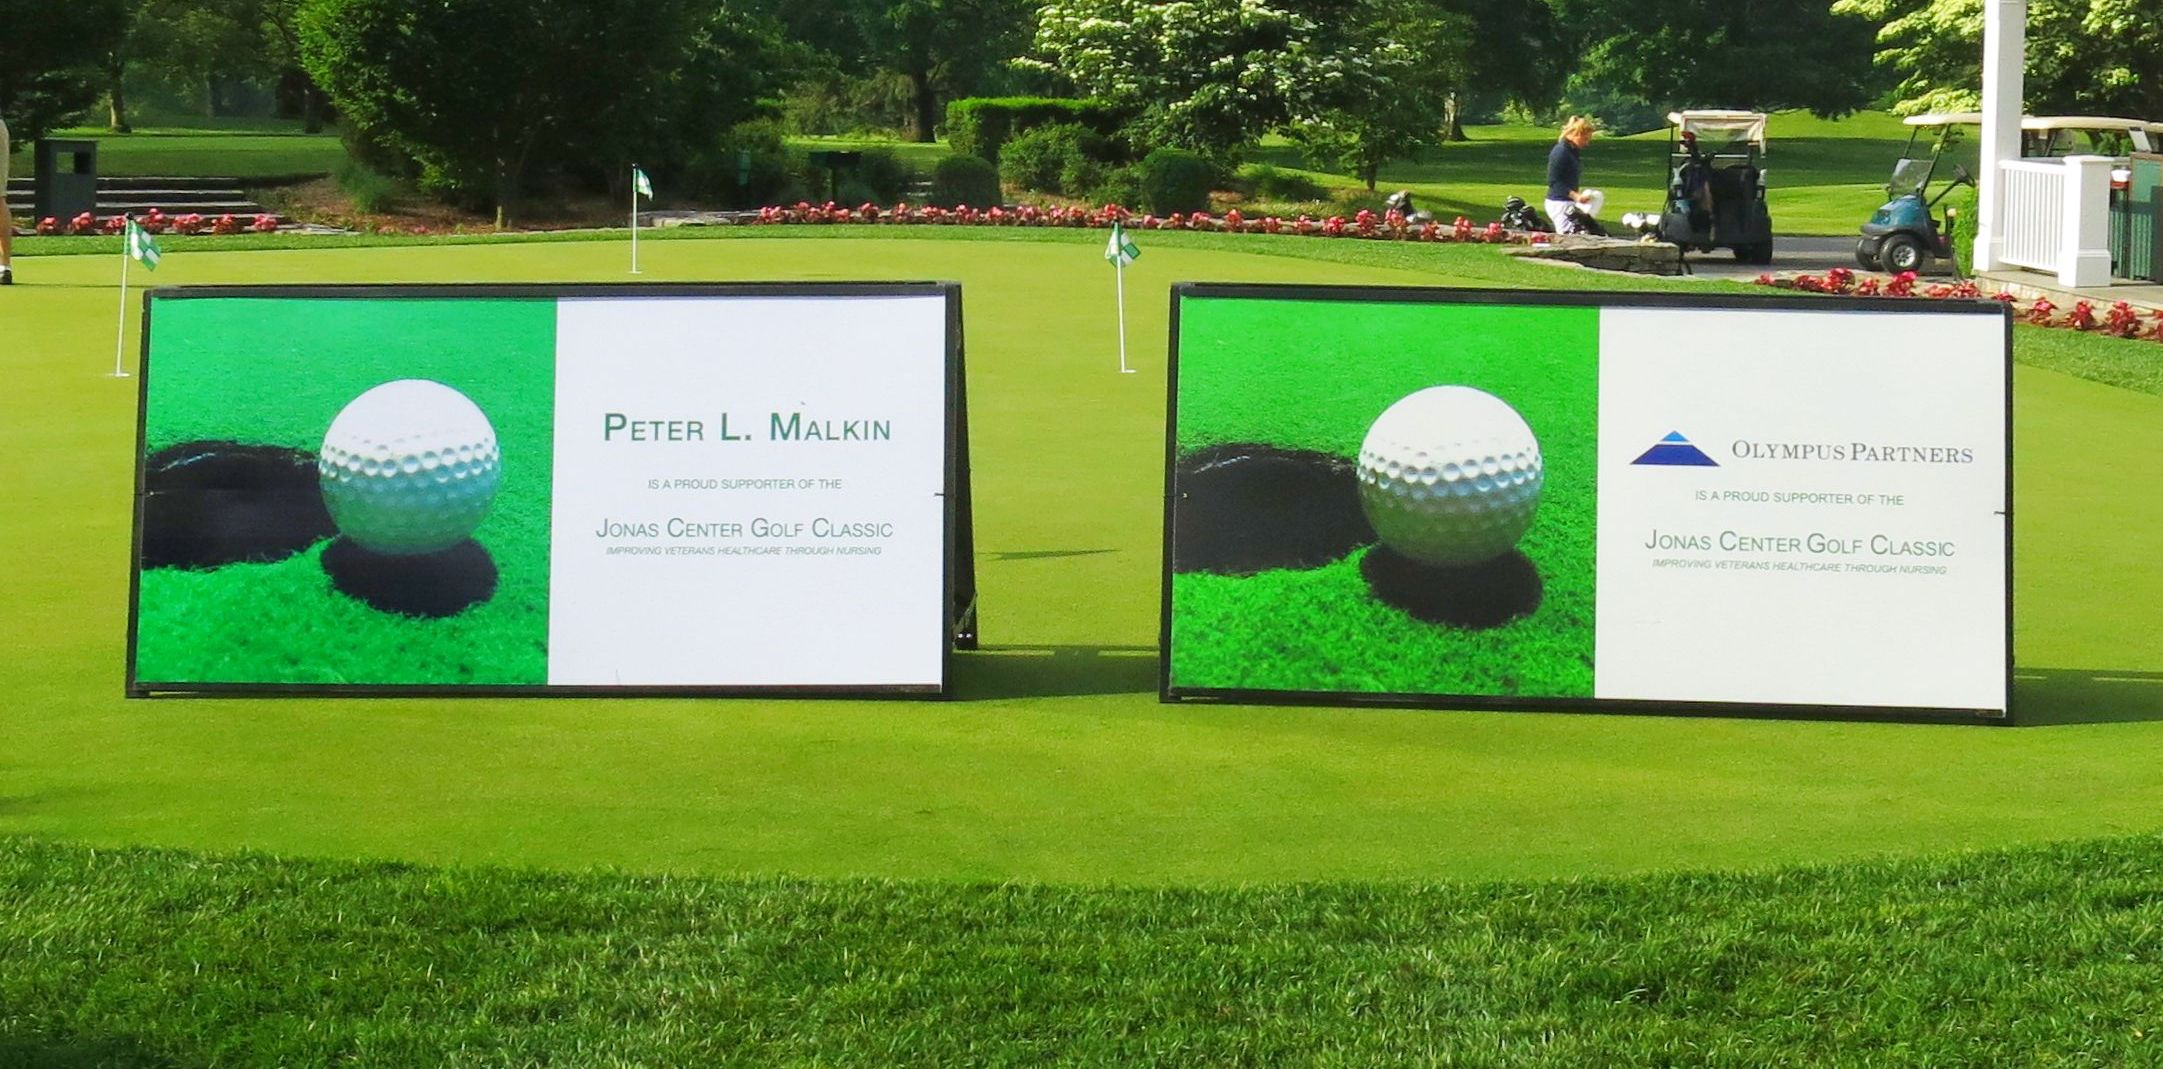 Jonas Center Golf Classic - SSS Walls